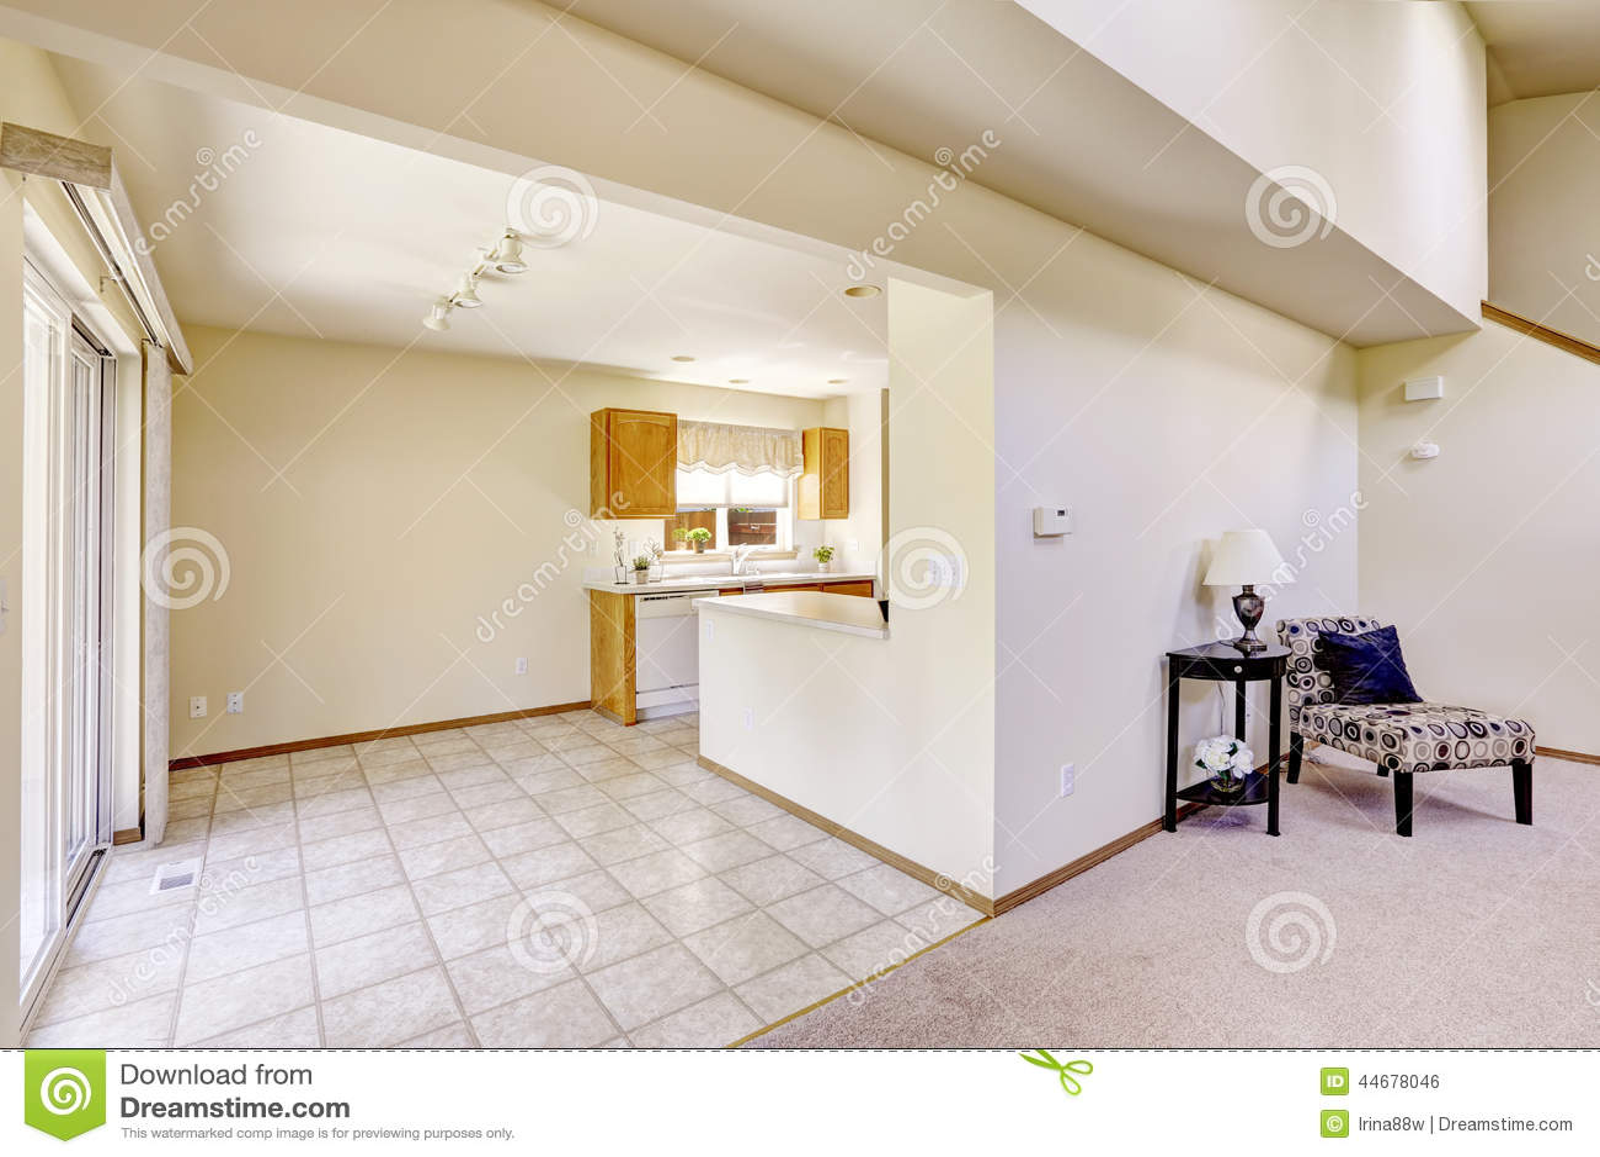 area rugs for kitchen and bath magazine 明亮的房间在空的房子里与砖地的厨房地区库存照片 图片包括有建筑 改造 明亮的房间在空的房子里与砖地的厨房地区